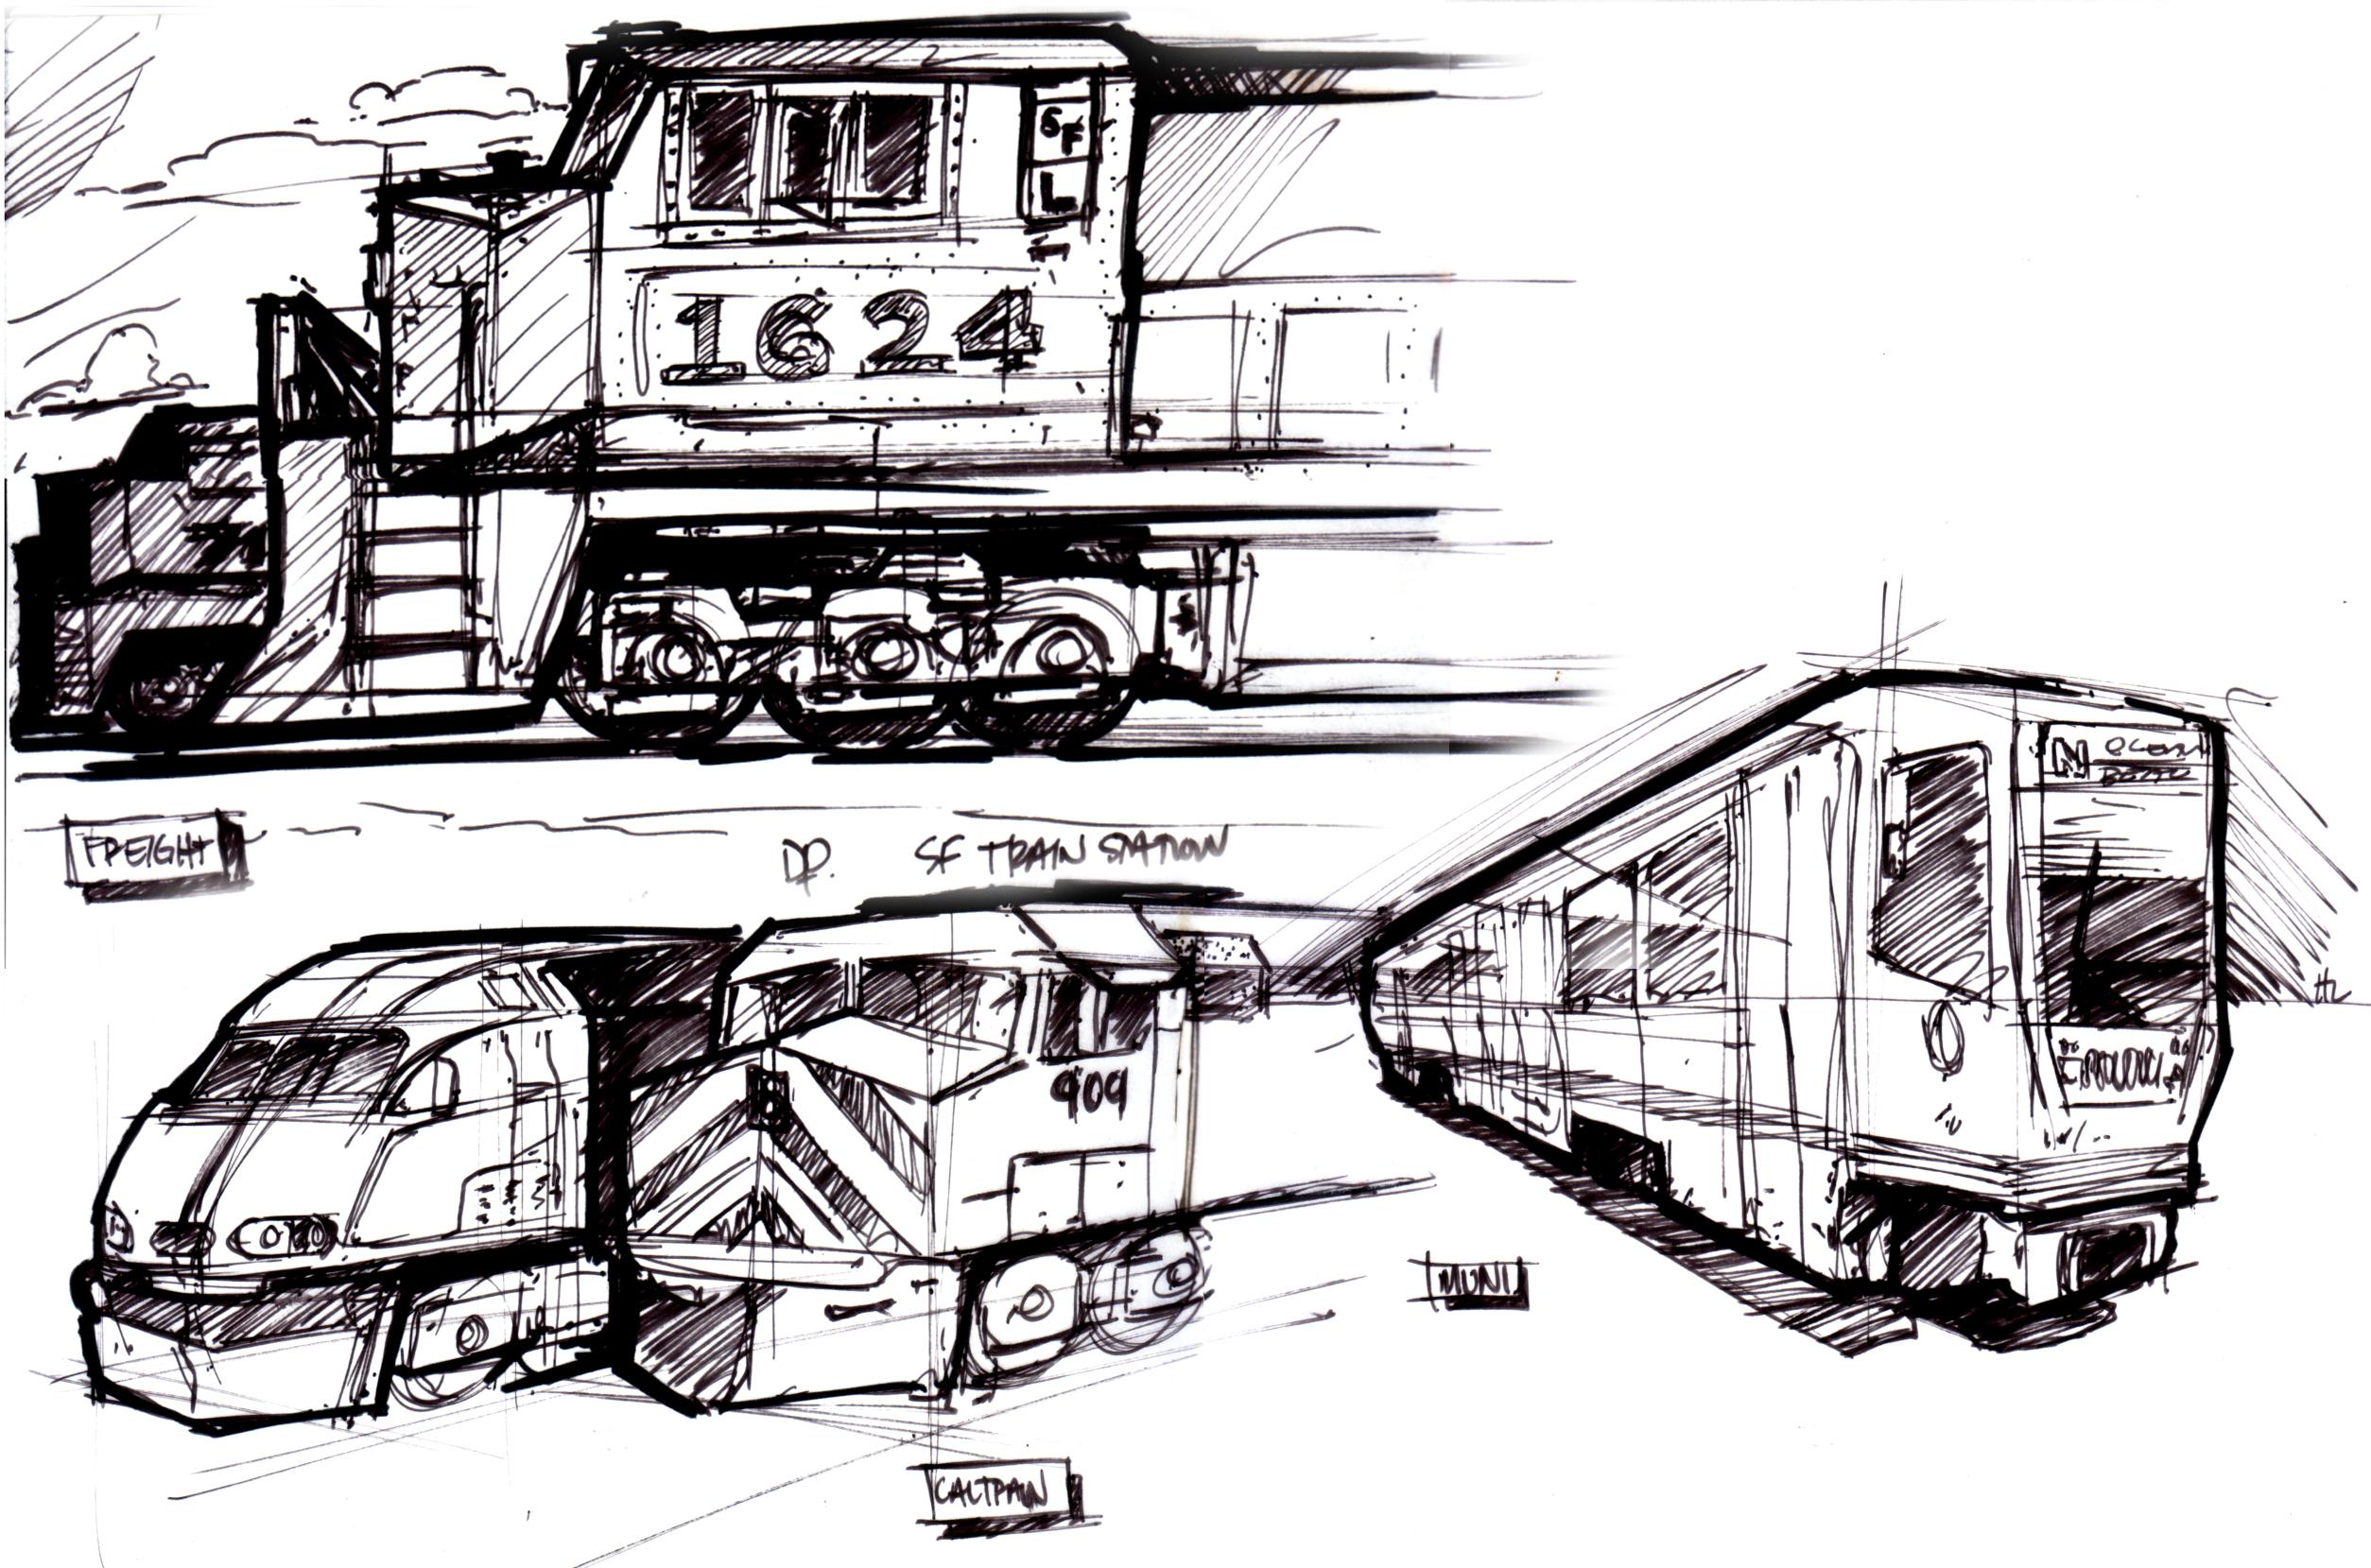 sf train station lineweights